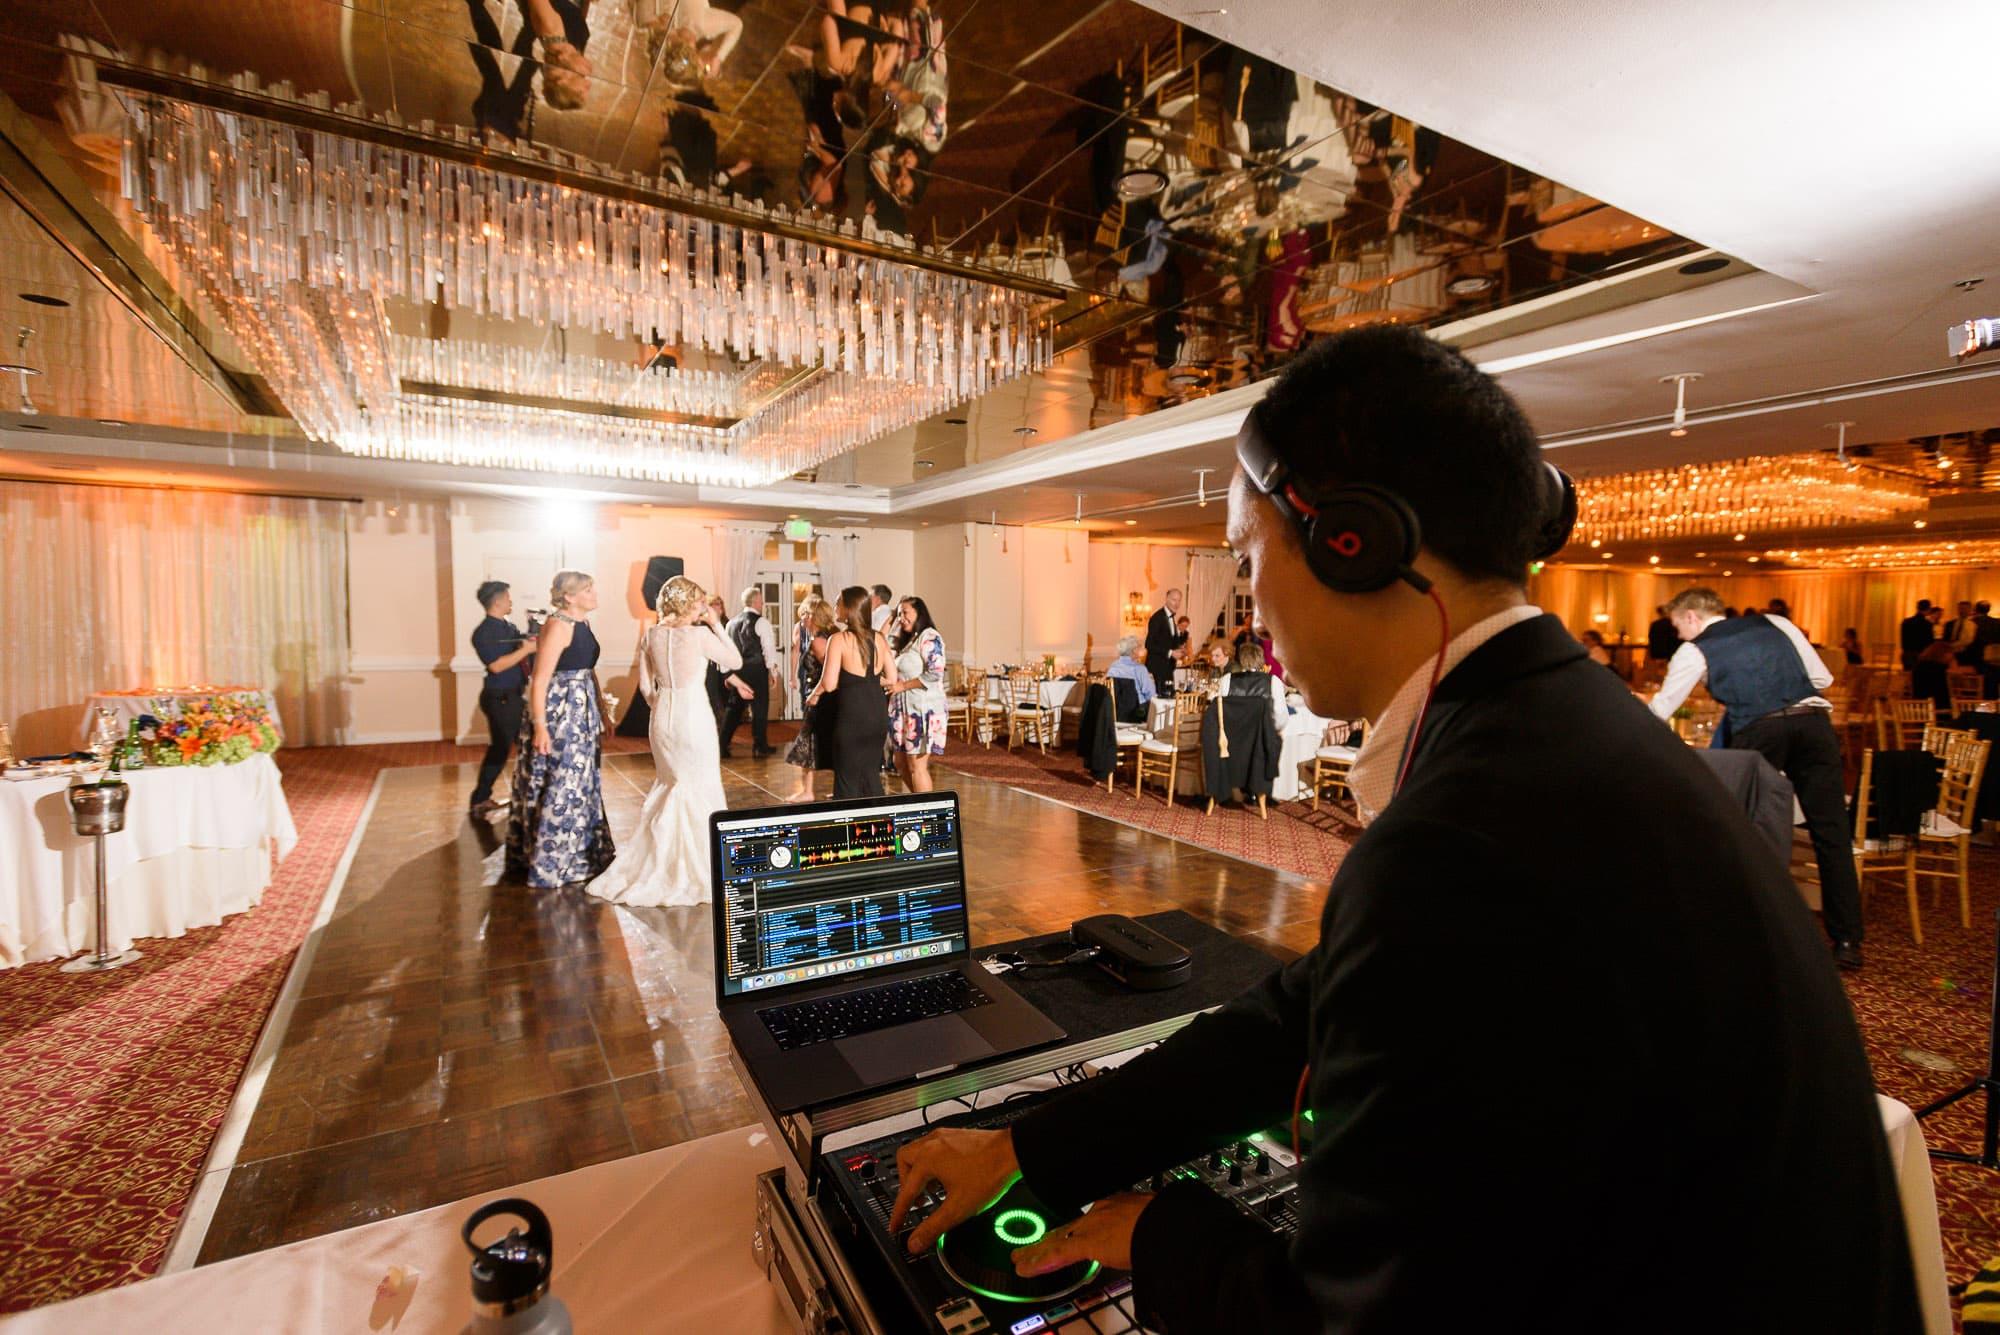 075_Alan_and_Heidi_Los_Angeles_Equestrian_Center_Wedding